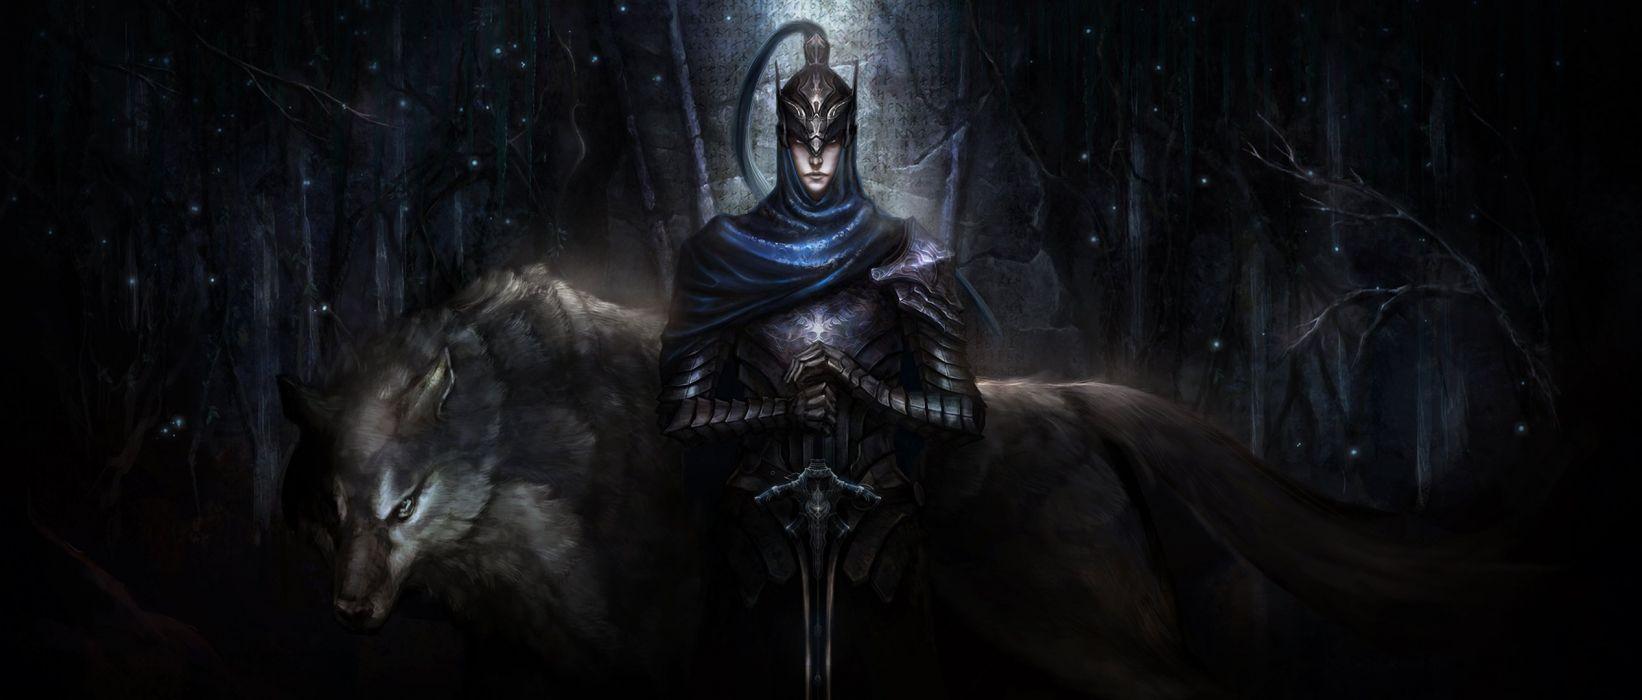 night-Artorias-with-wolf-standing-in-the-dark armor art artorias boss Artorias of the Abyss dark dark souls game helmet Knight Artorias sword warrior wolf wallpaper